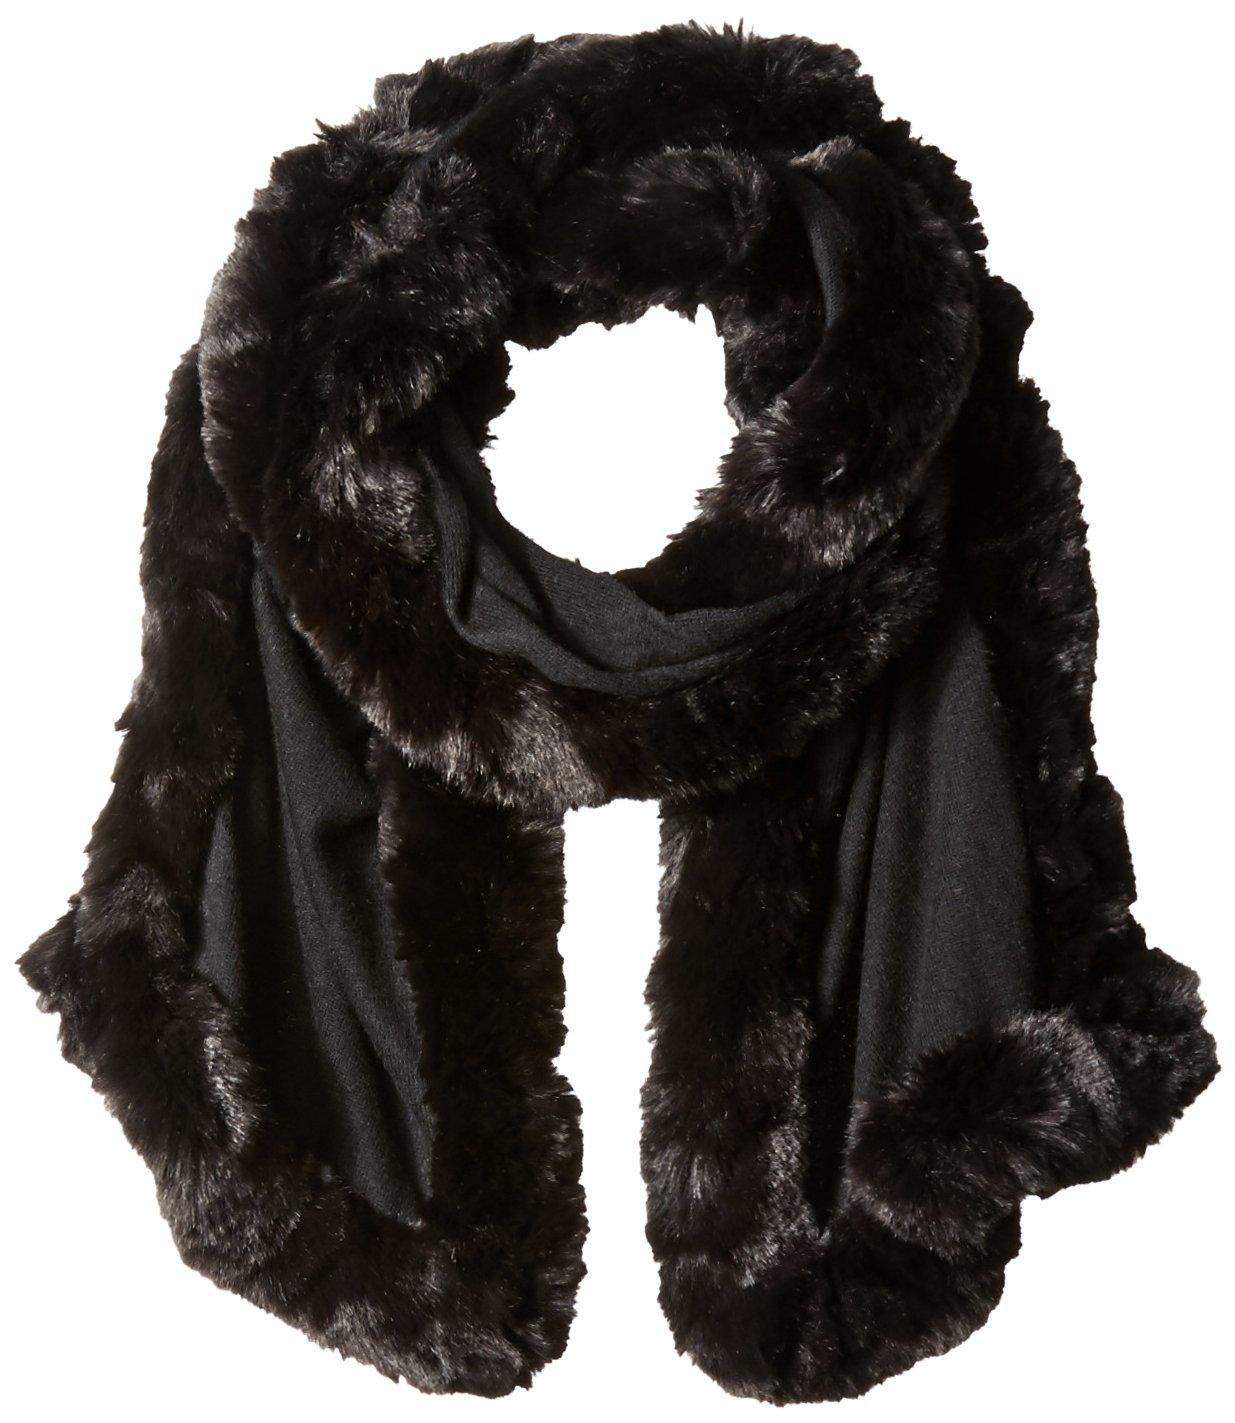 Badgley Mischka Women's Knit Wrap Scarf With Faux Chinchilla Trim, black/black, One Size